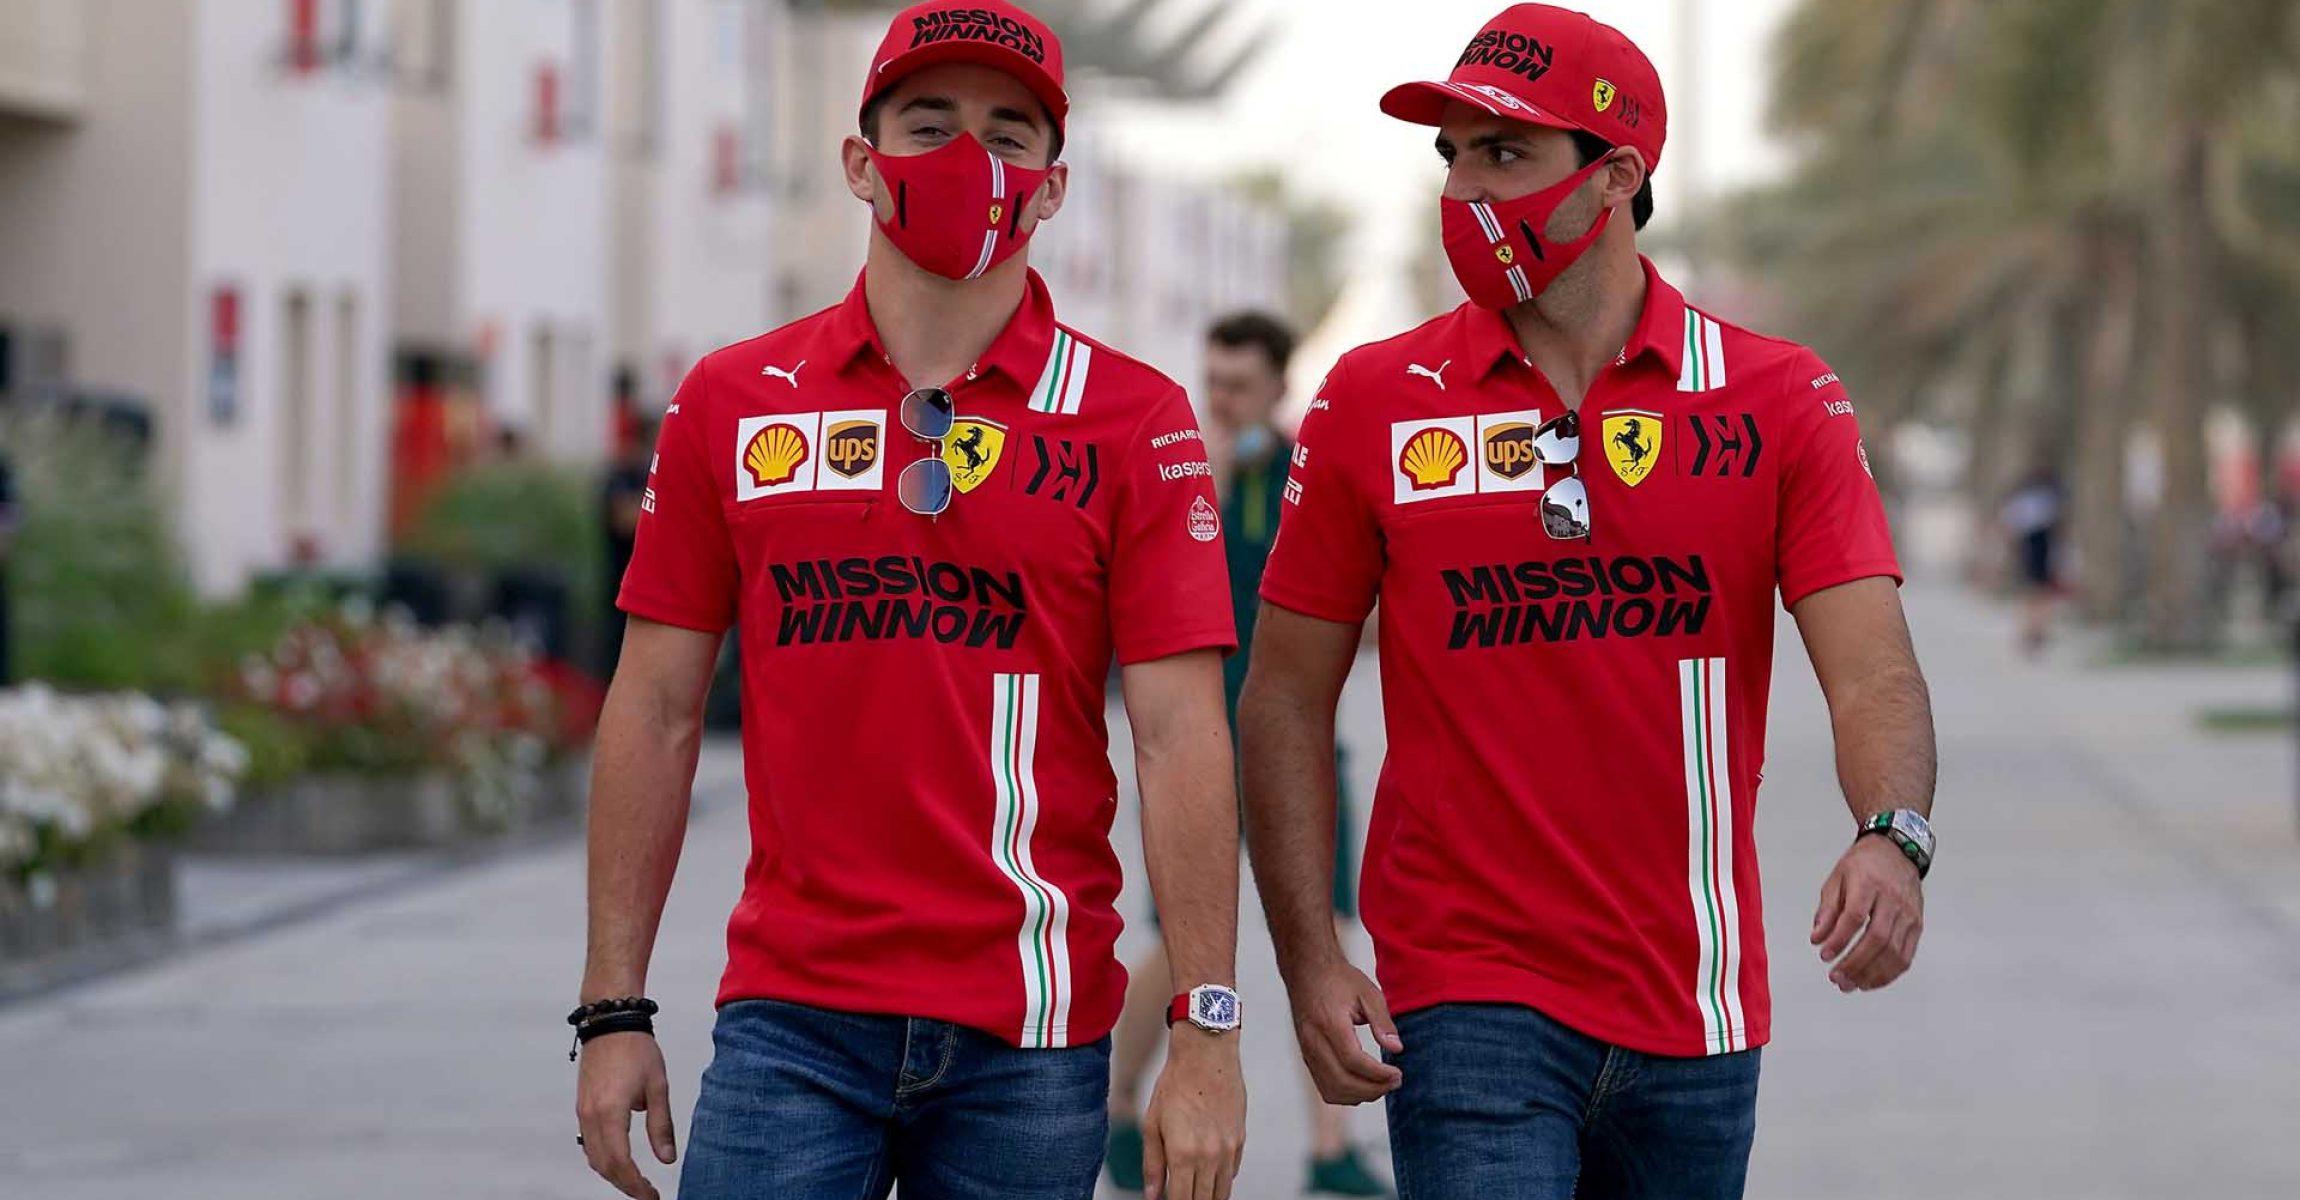 GP BAHRAIN  F1/2021 - GIOVEDÌ  25/03/2021   credit: @Scuderia Ferrari Press Office Charles Leclerc Carlos Sainz